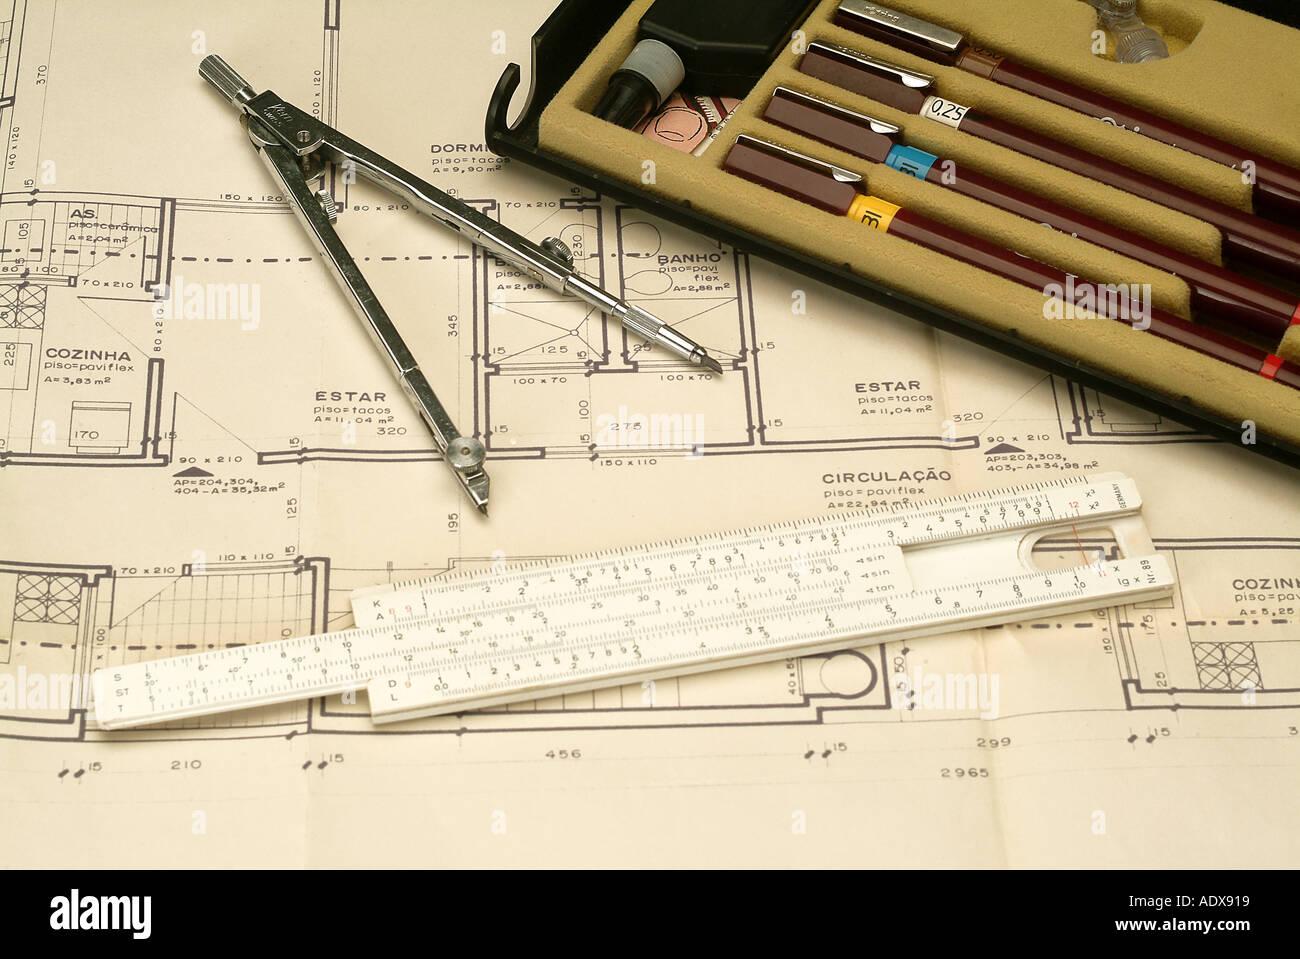 Architecture ink pens ruler concept conceptual compass blueprint architecture ink pens ruler concept conceptual compass blueprint diagram project scheme architecture malvernweather Image collections